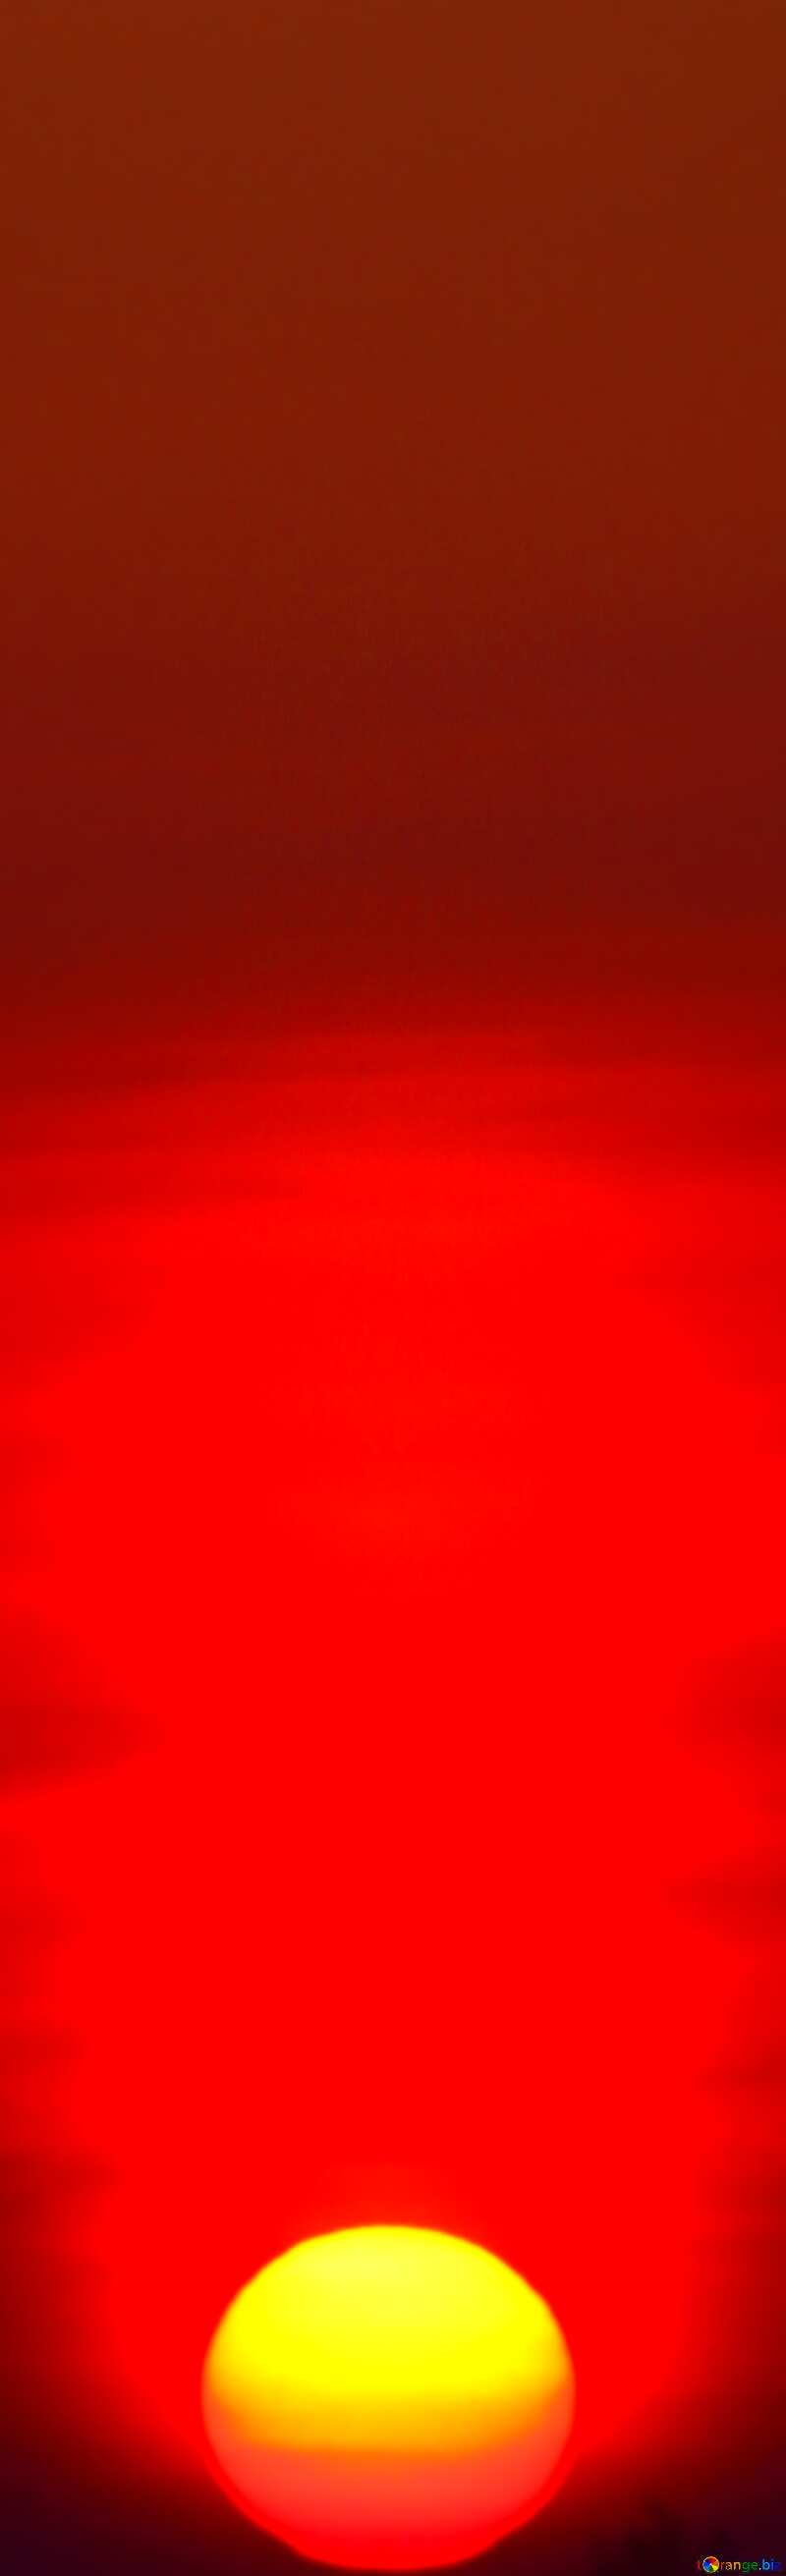 Red Sunset vertical banner Background. №1334